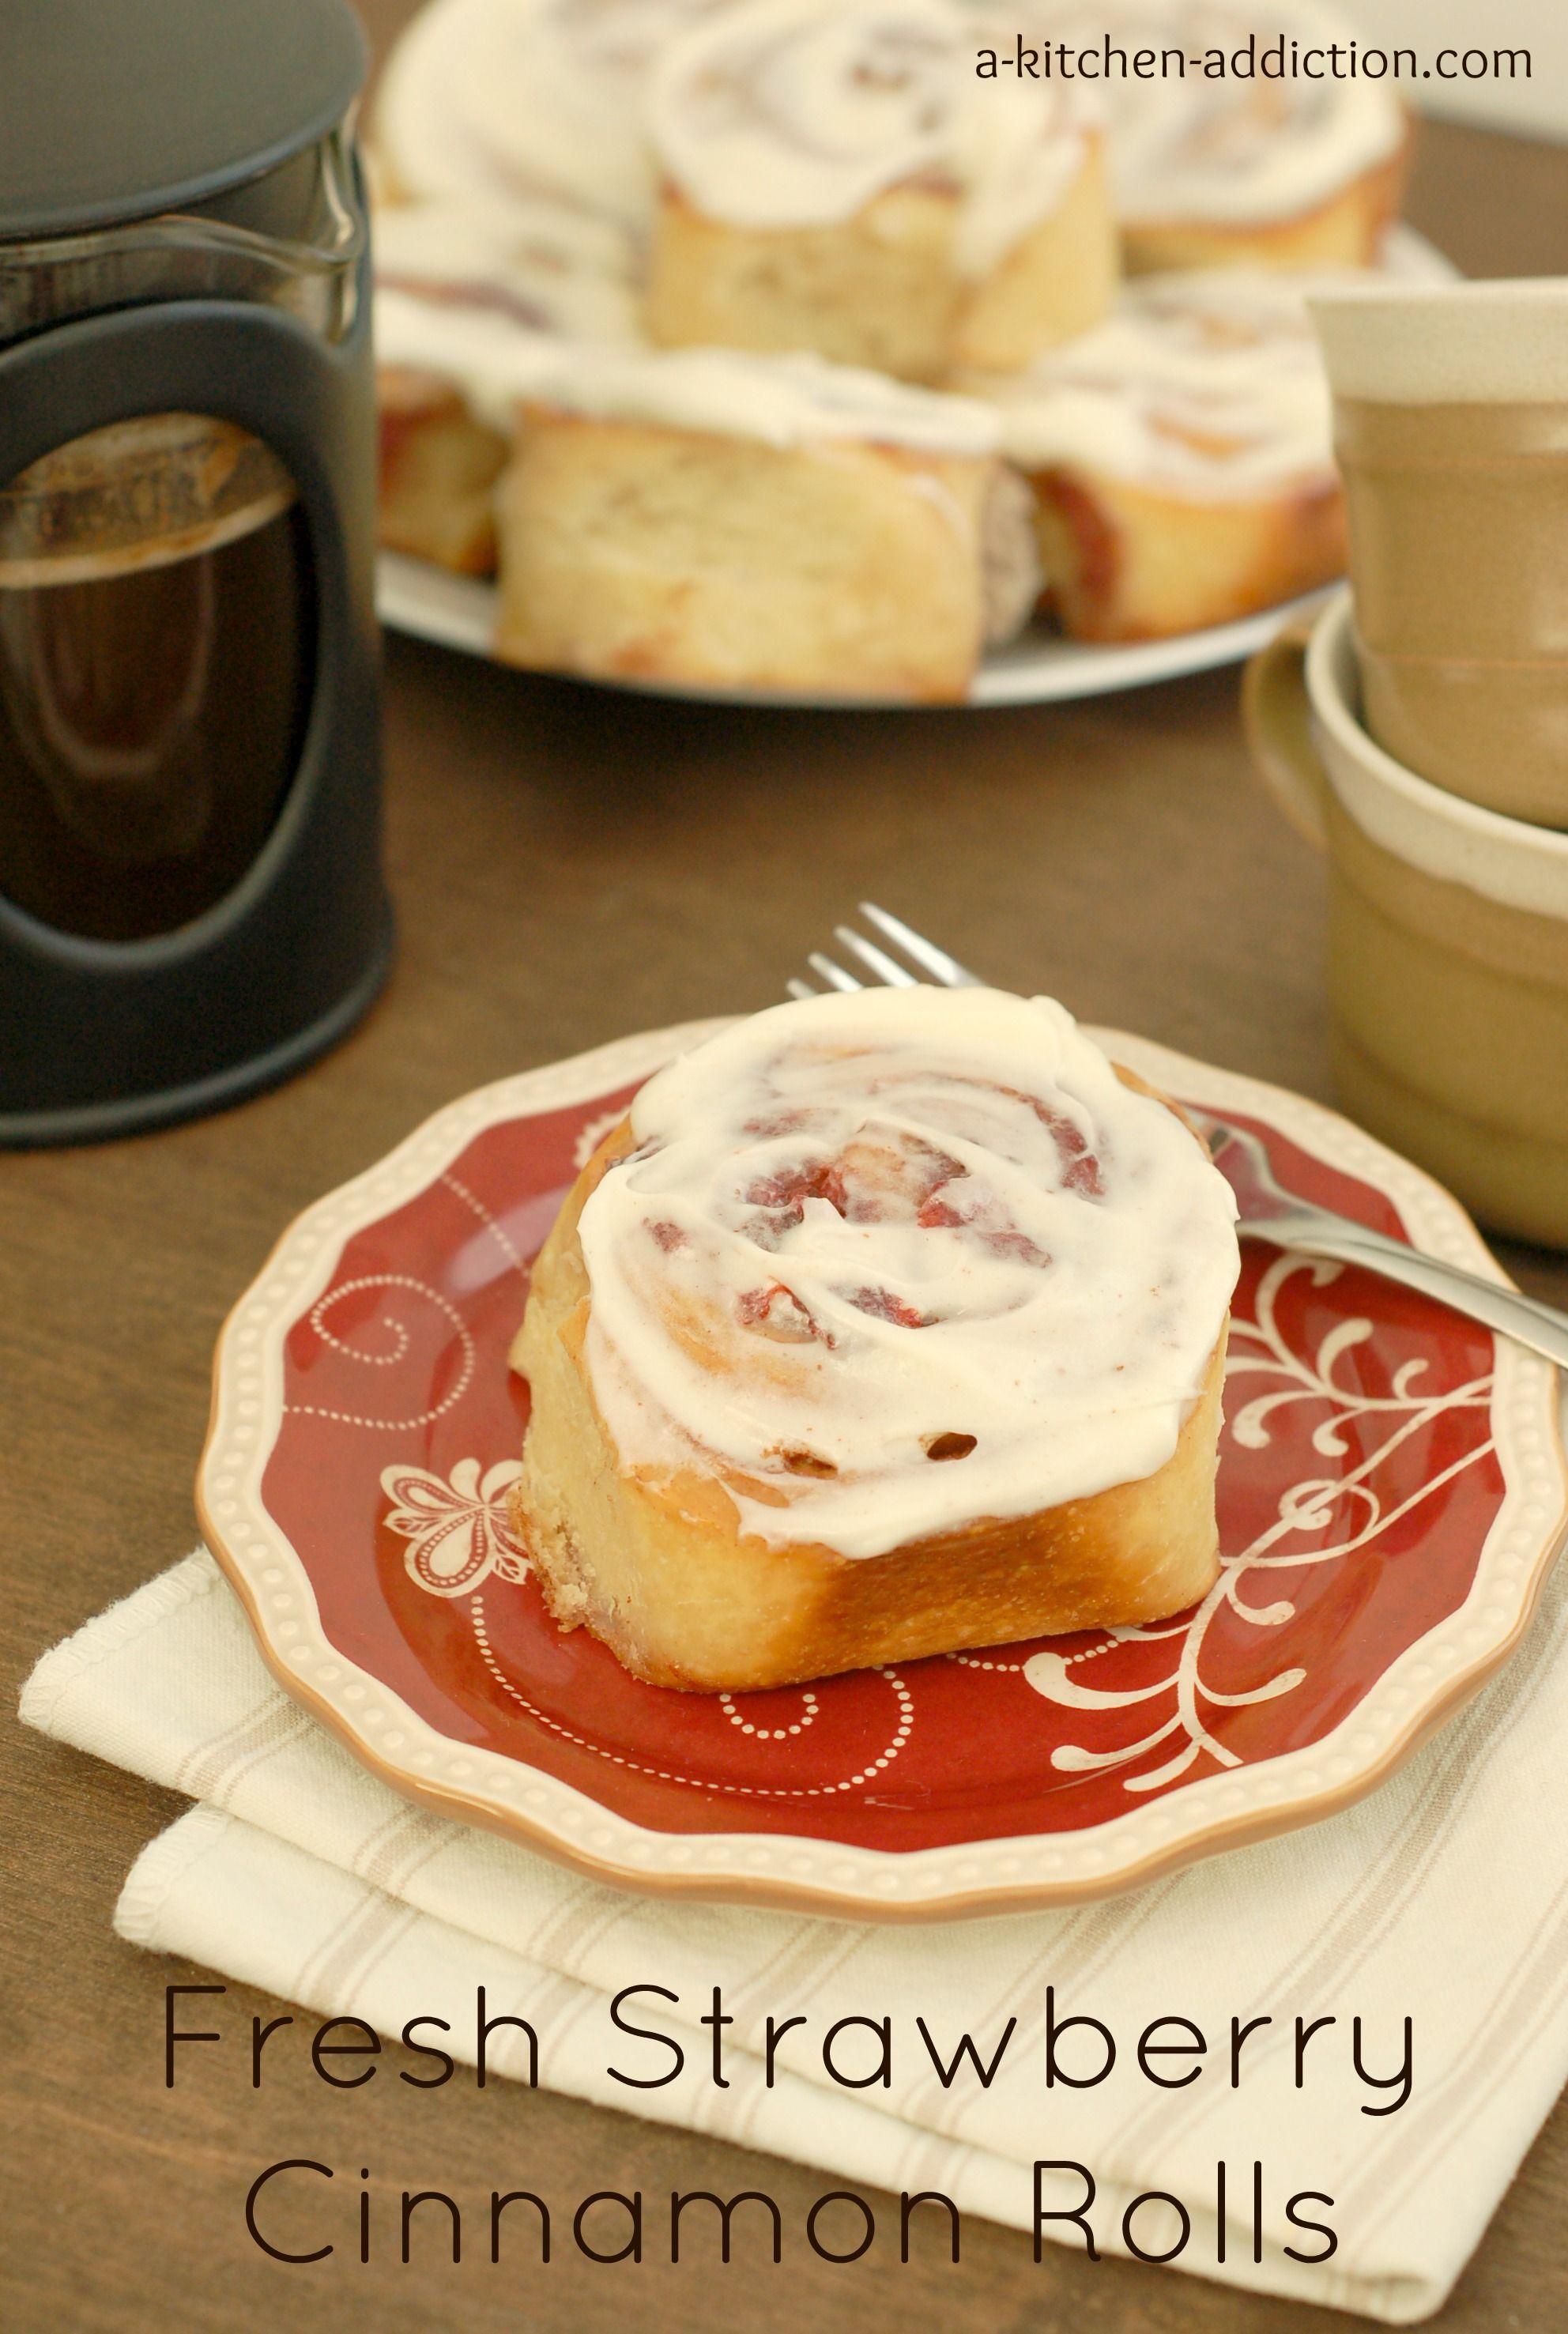 Fresh Strawberry Cinnamon Rolls Bread - Heart Baked